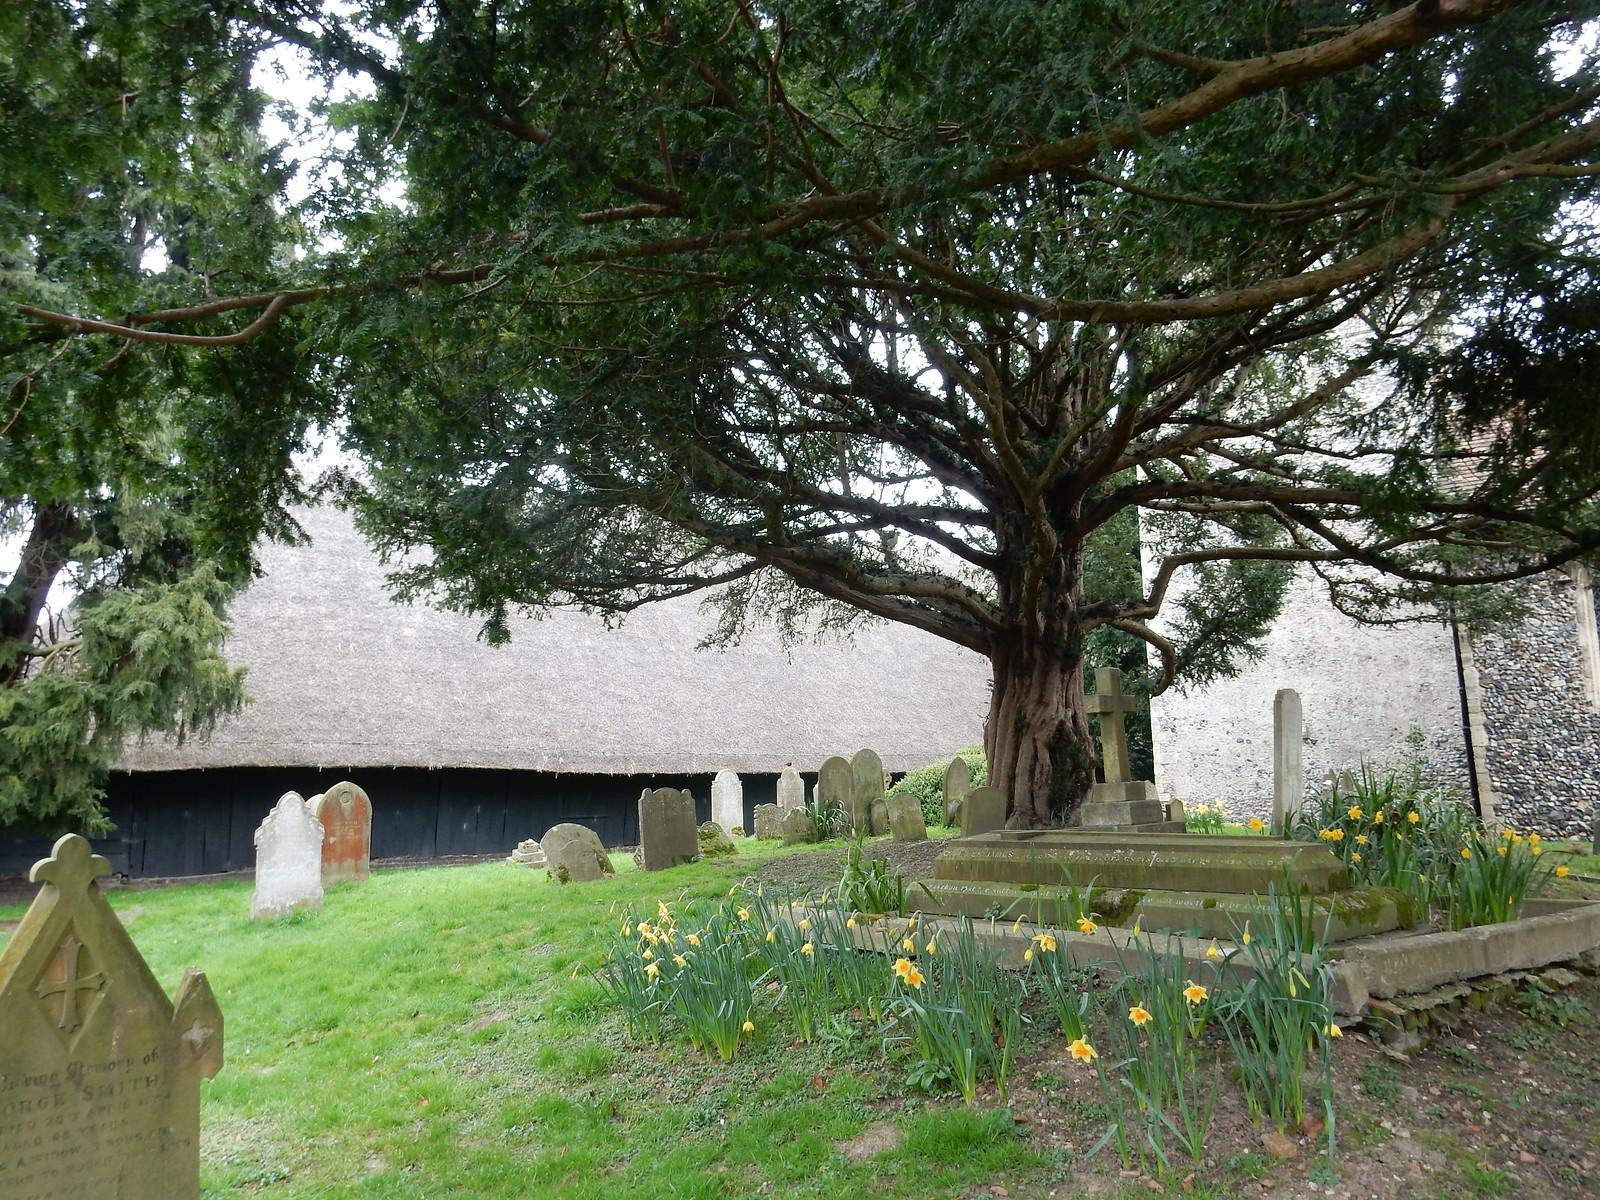 Littlebourne Churchyard Sturry Circular Littlebourne Churchyard